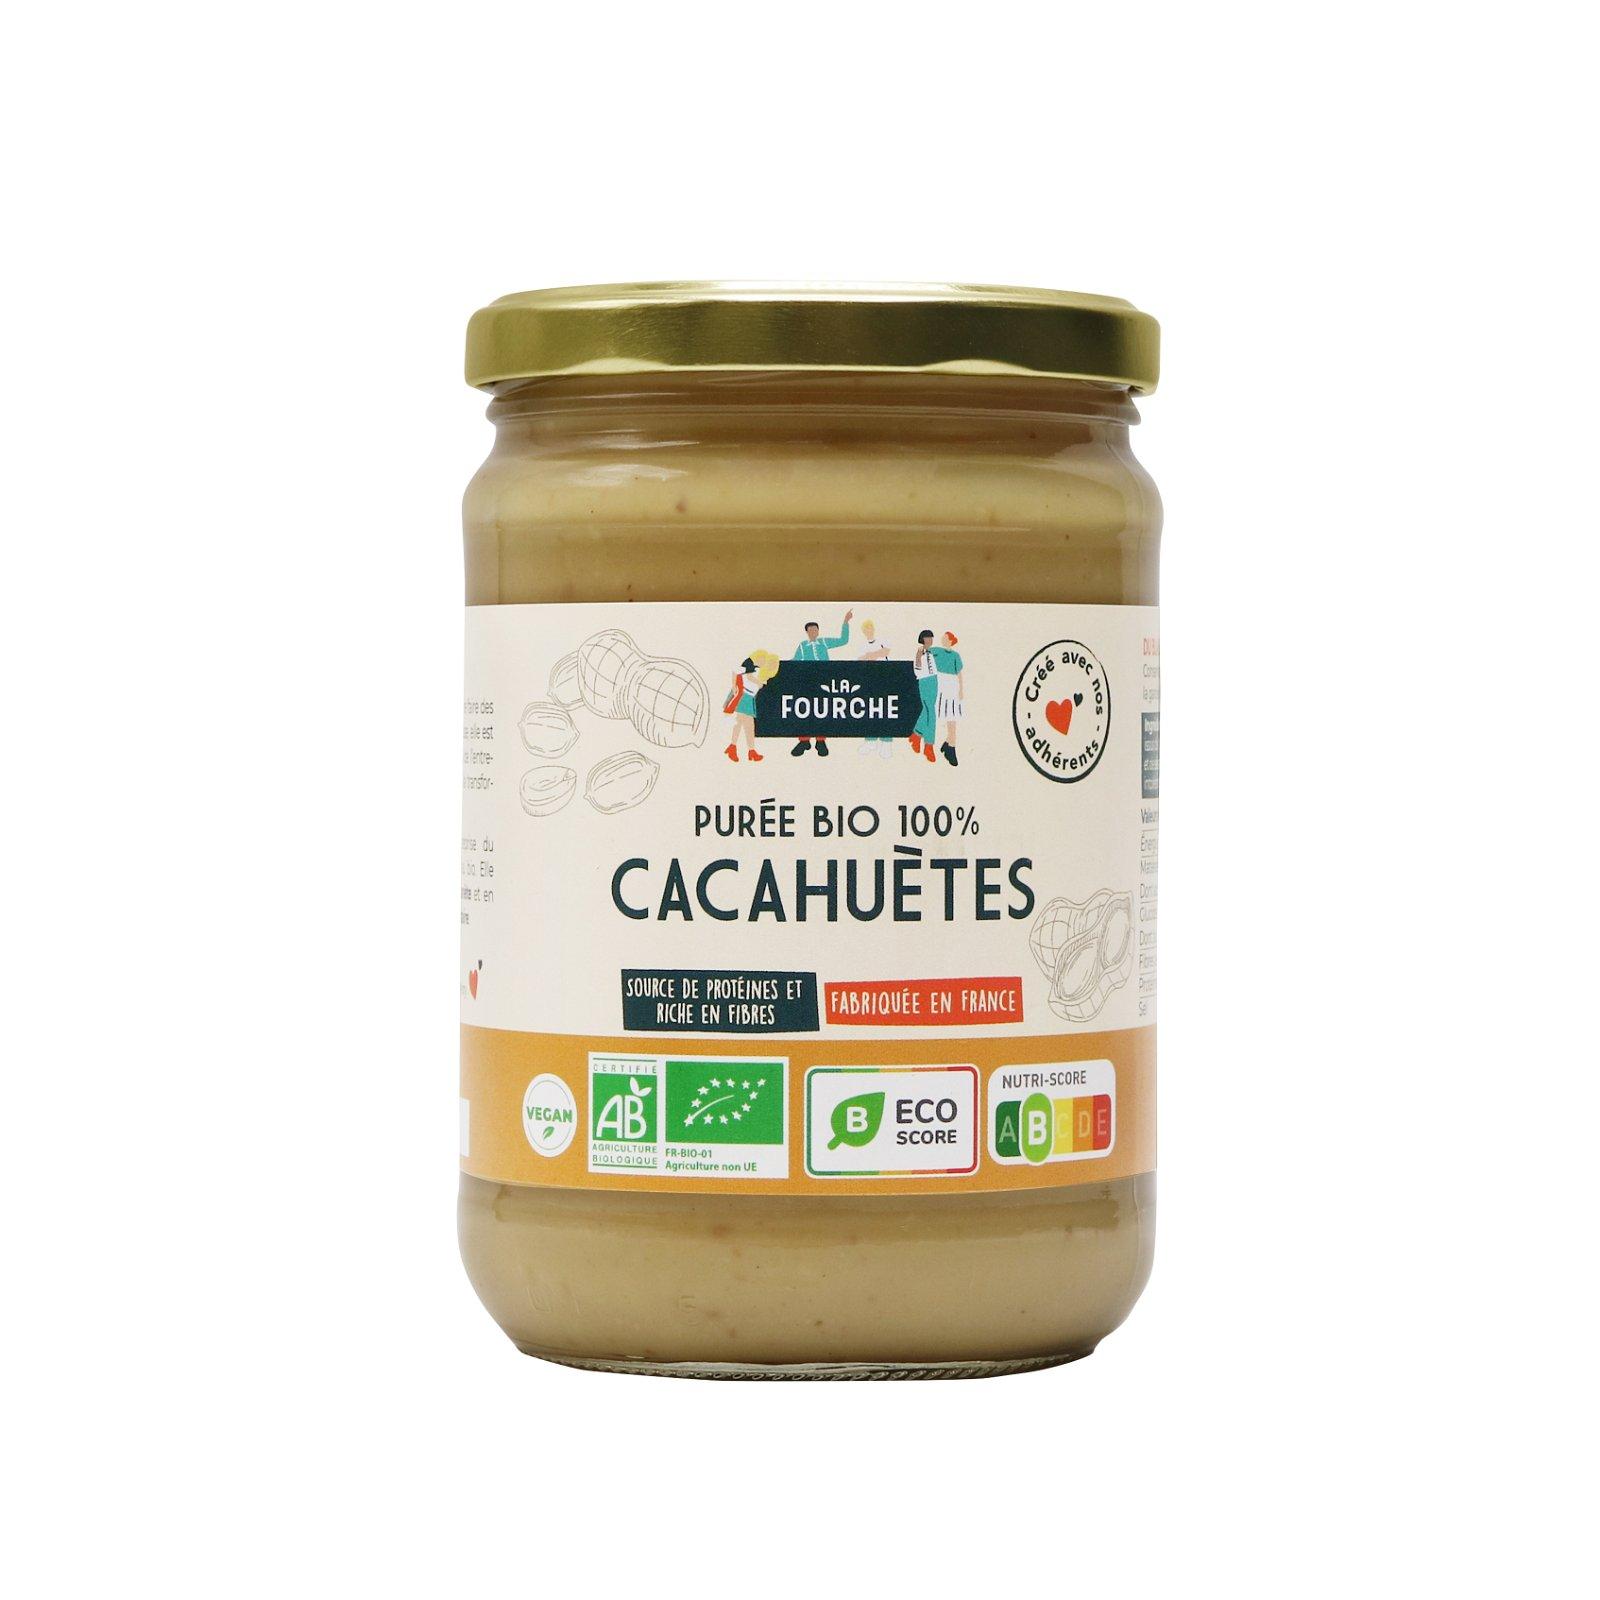 img-la-fourche-puree-100-cacahuetes-bio-0-5kg